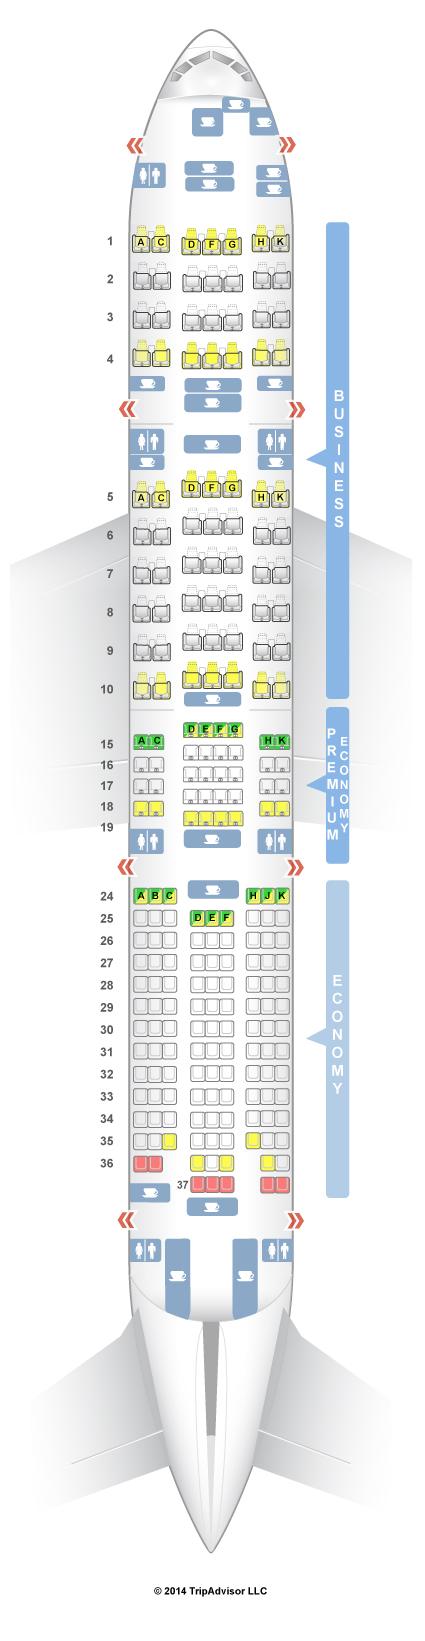 Cathay Pacific Seatguru 777 300er Wallseatco